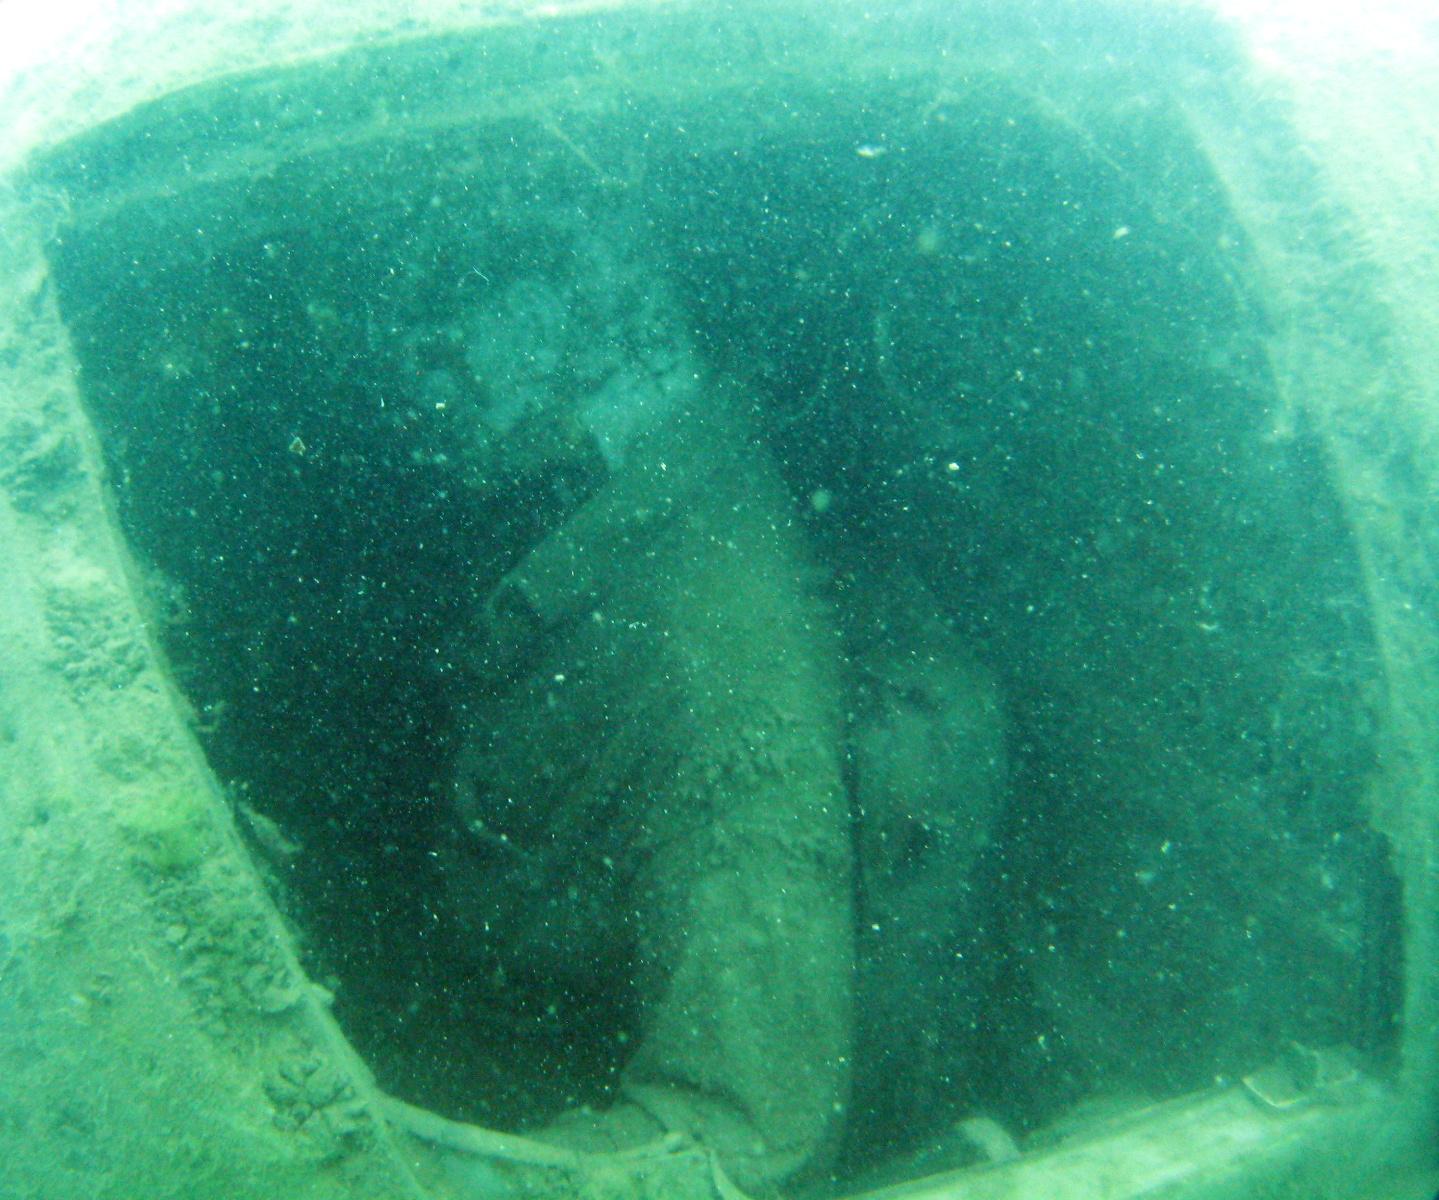 22 Photographs Cataloging the Edmund Fitzgerald Disaster ...  |Edmund Fitzgerald Crew Remains